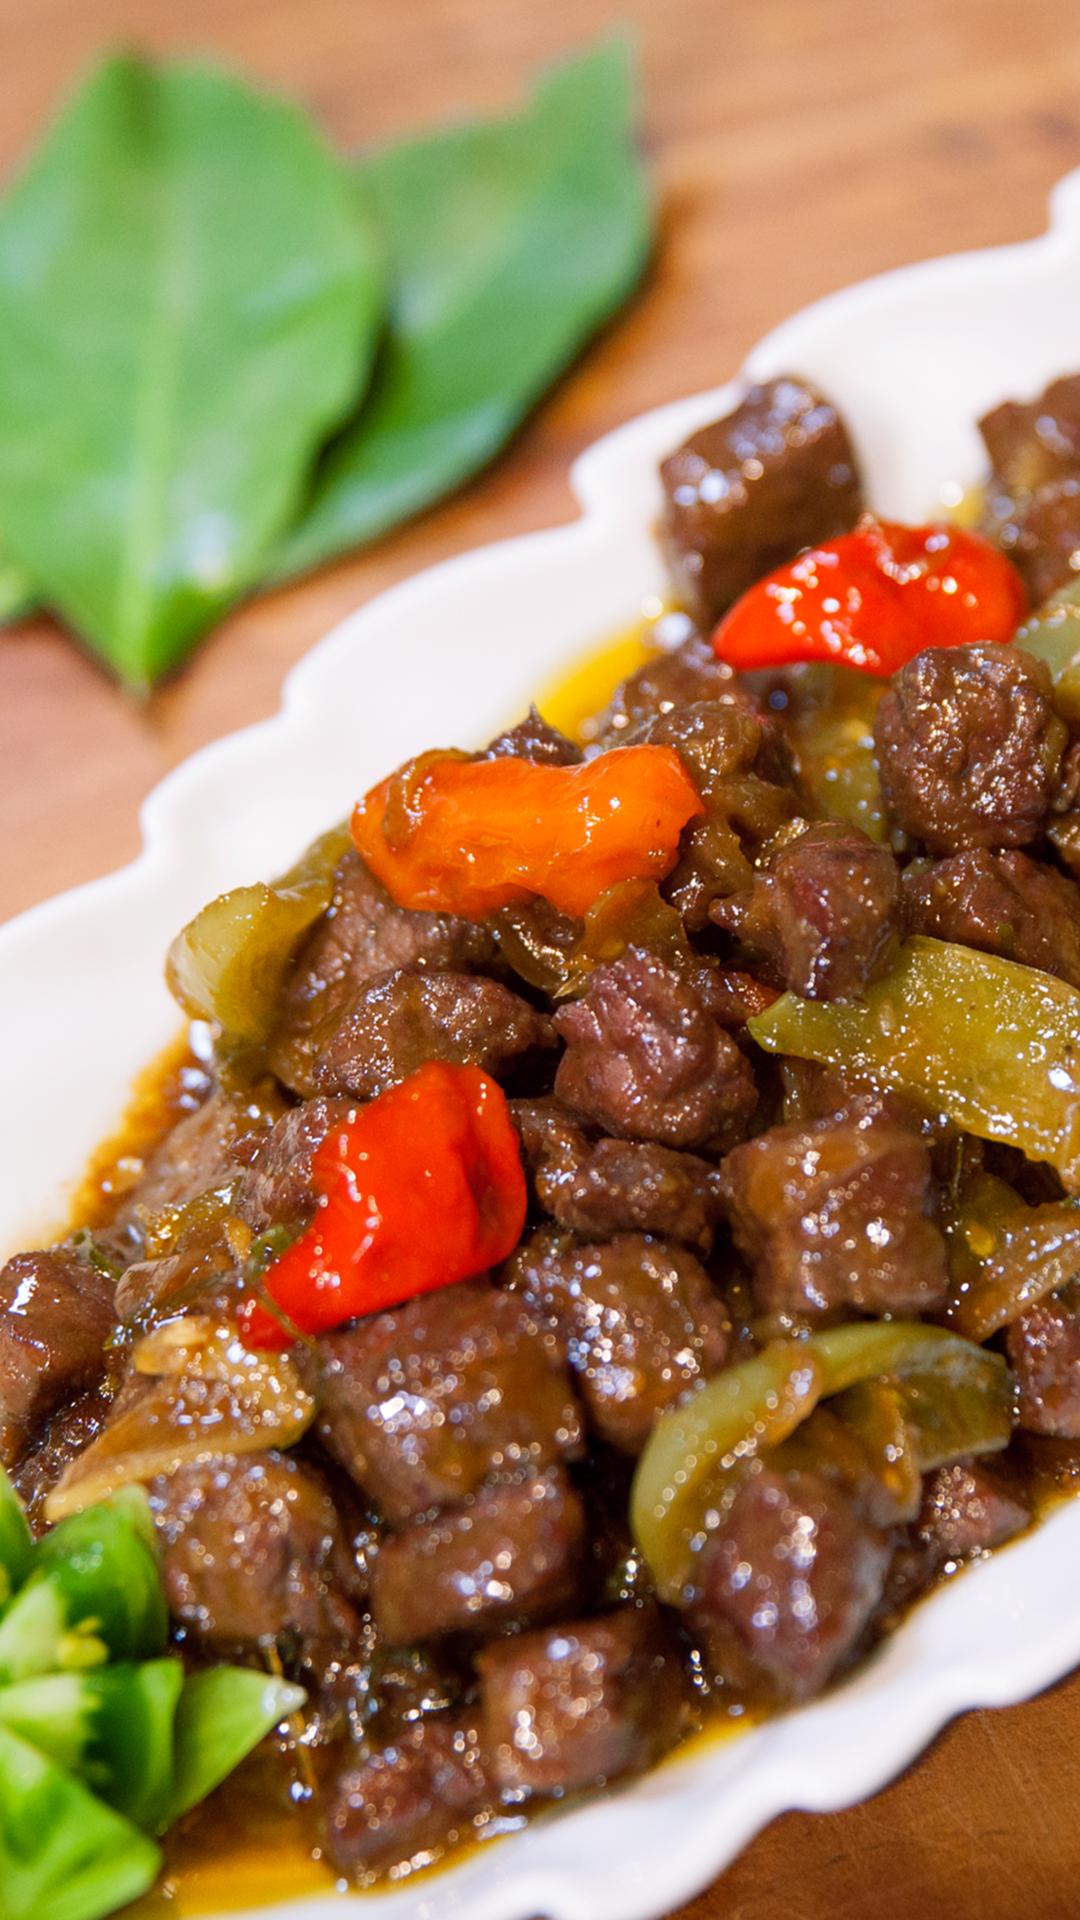 Video Sate Goreng Daging Sapi Resep Daging Sapi Masakan Resep Masakan